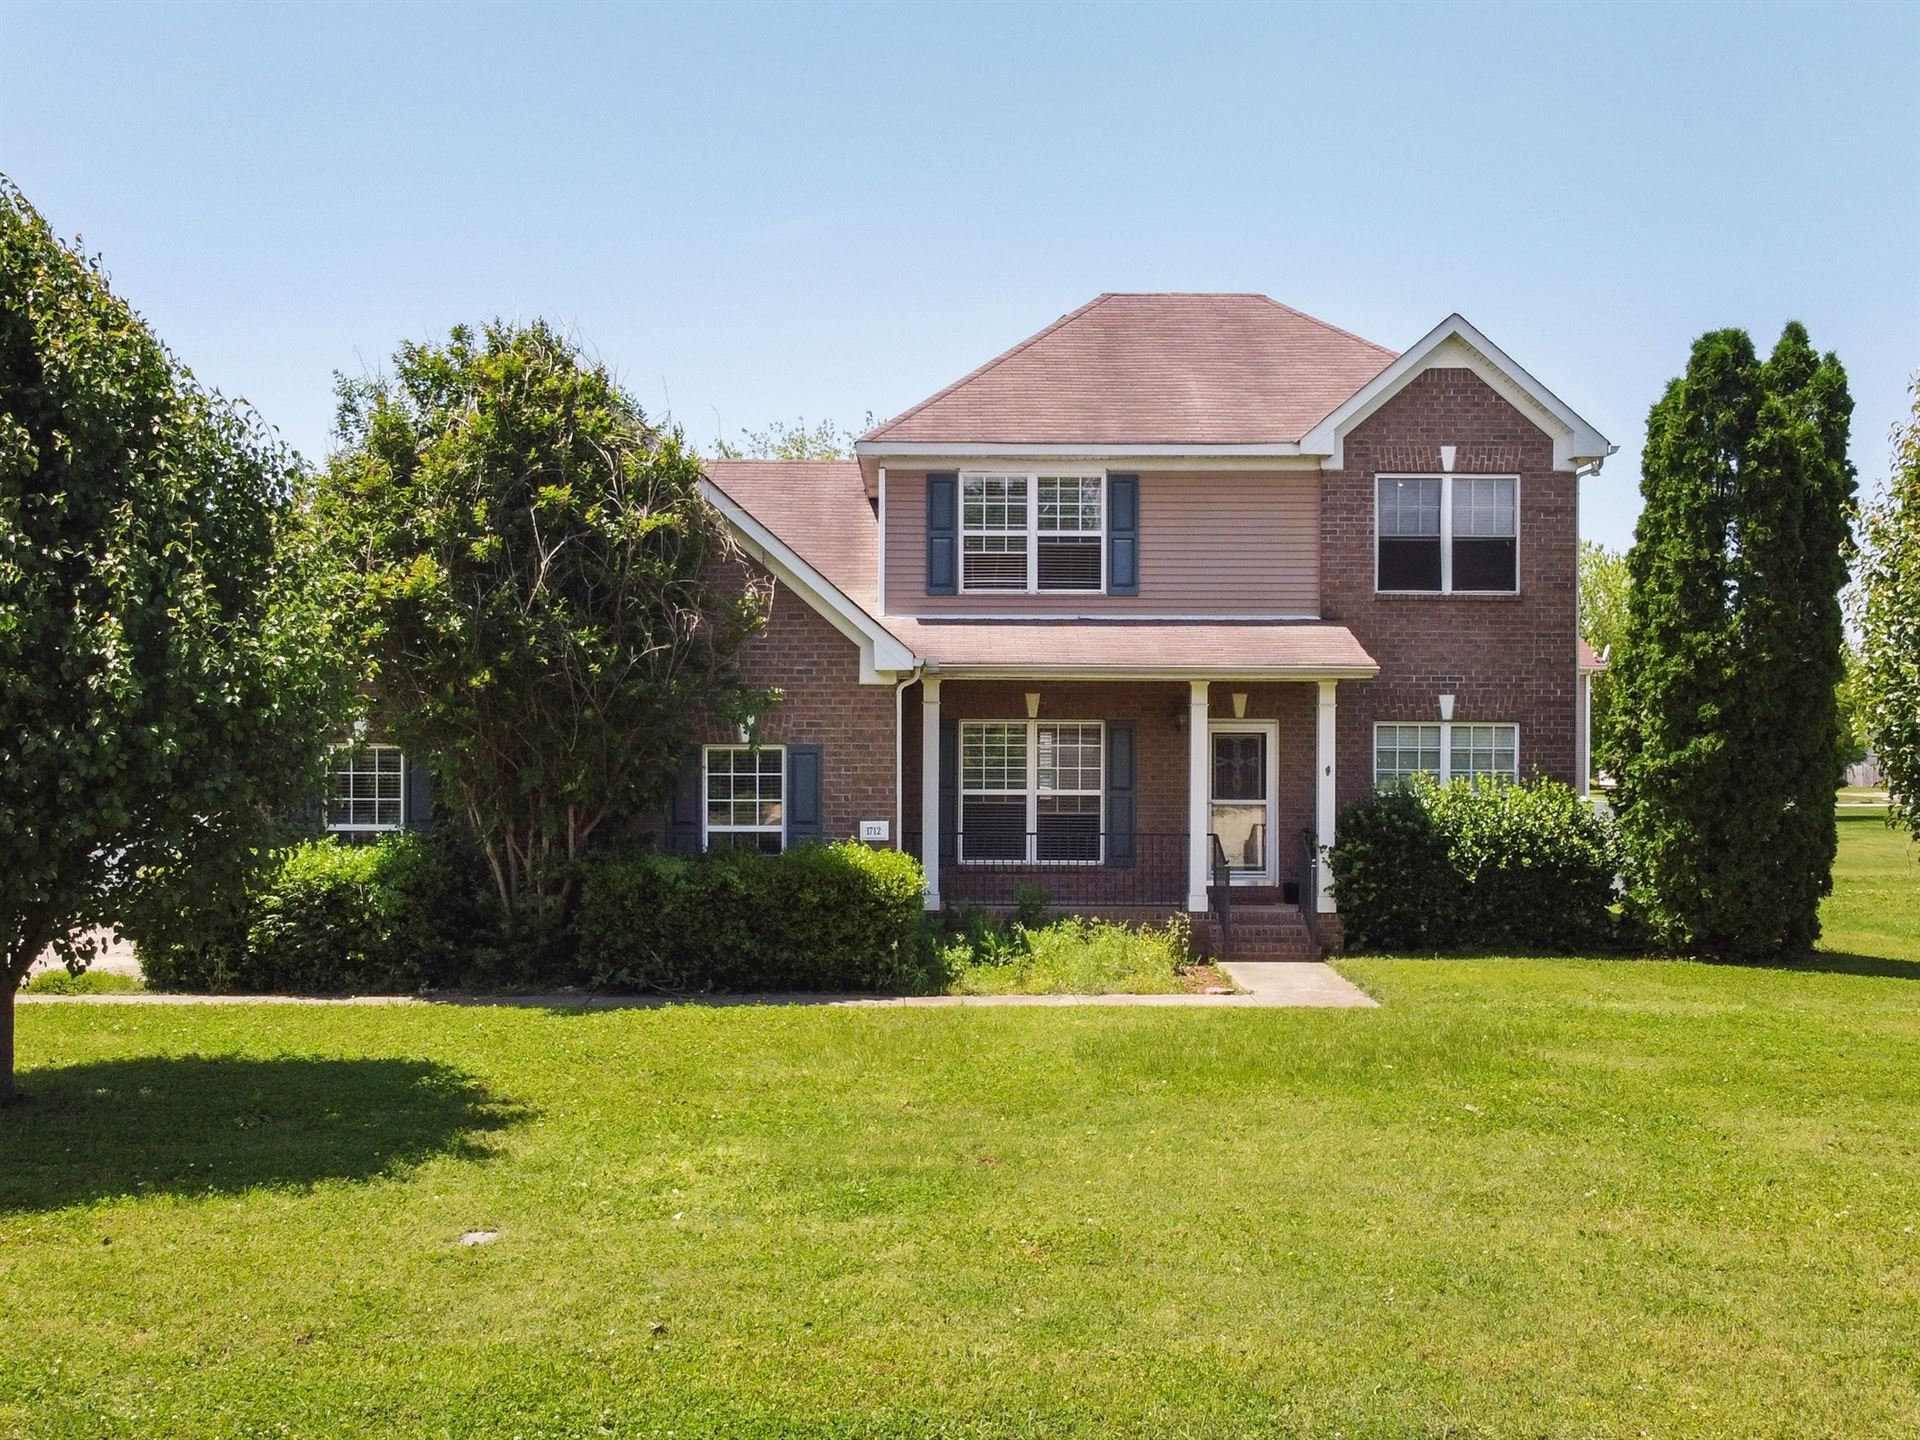 1712 Satterfield Ct, Murfreesboro, TN 37128 - MLS#: 2251537